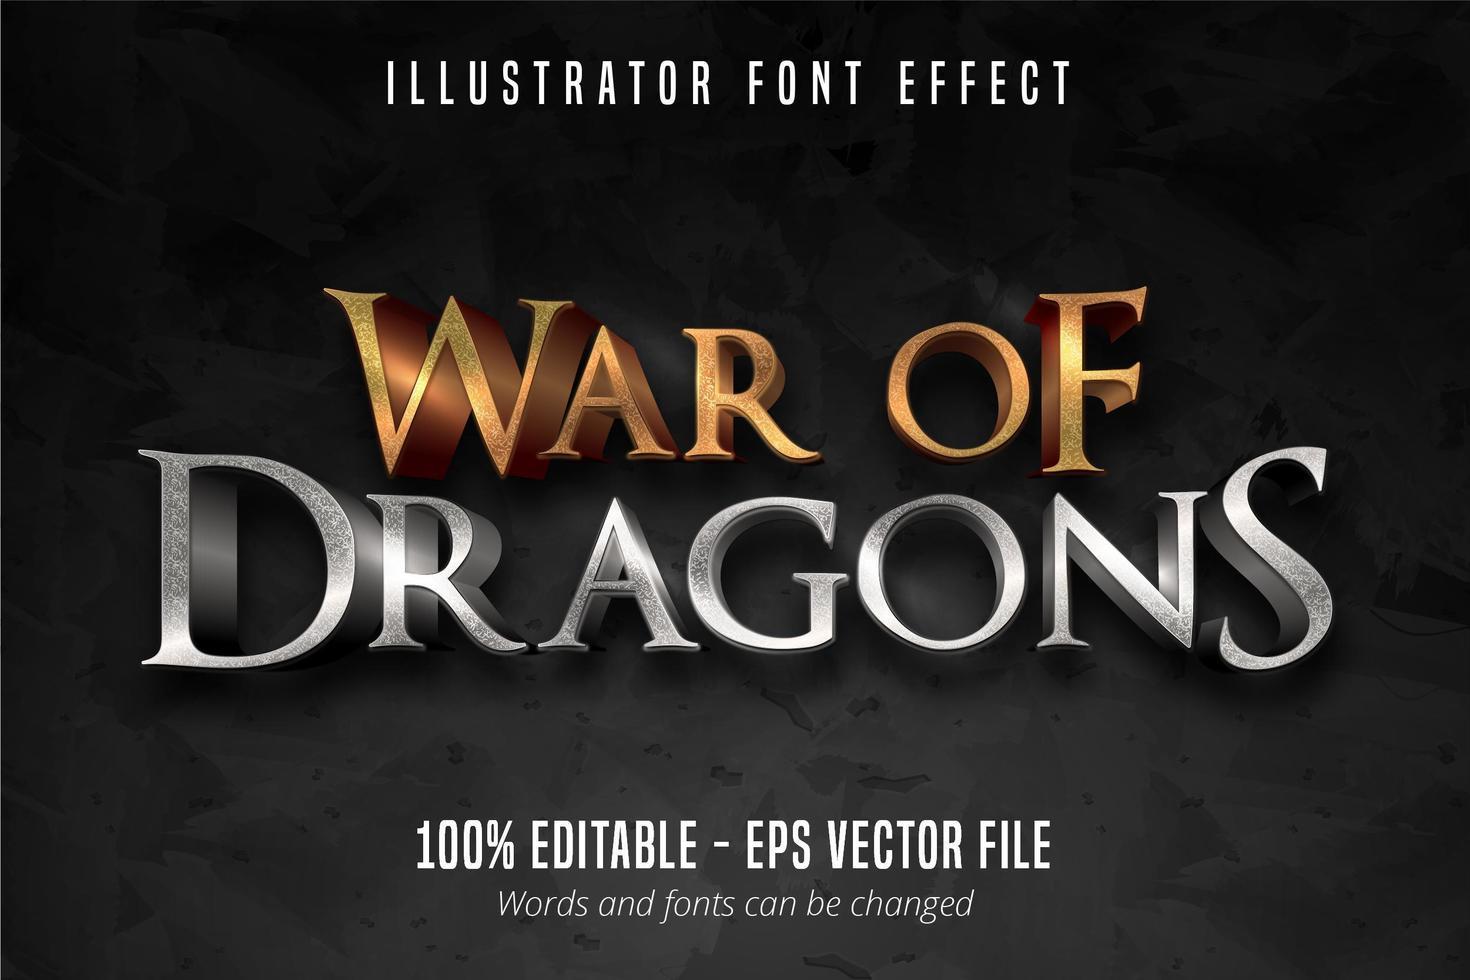 war of dragons text font effekt vektor